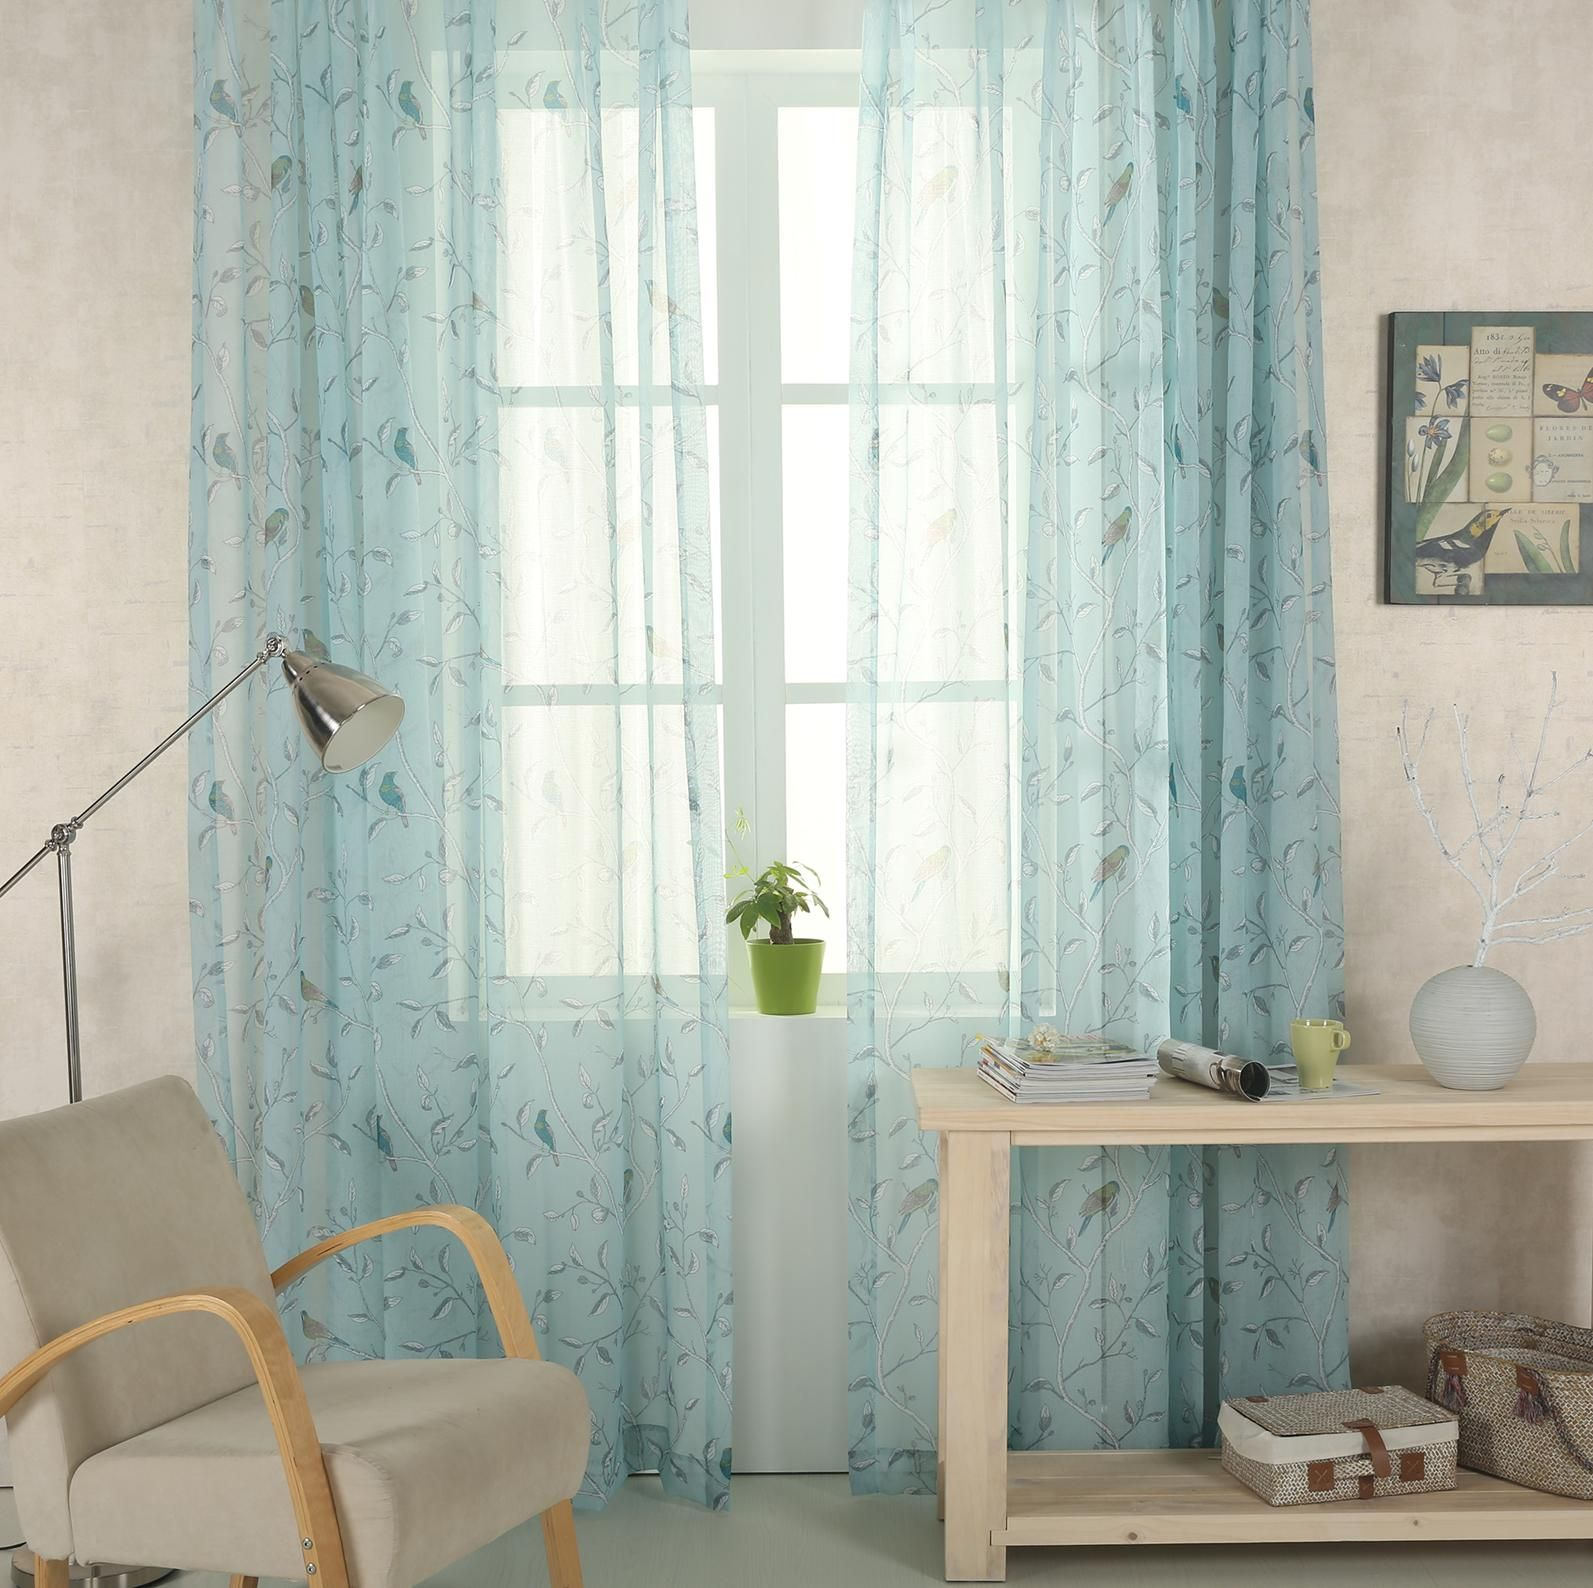 Oriental bird voile panel curtainsathome birds curtains